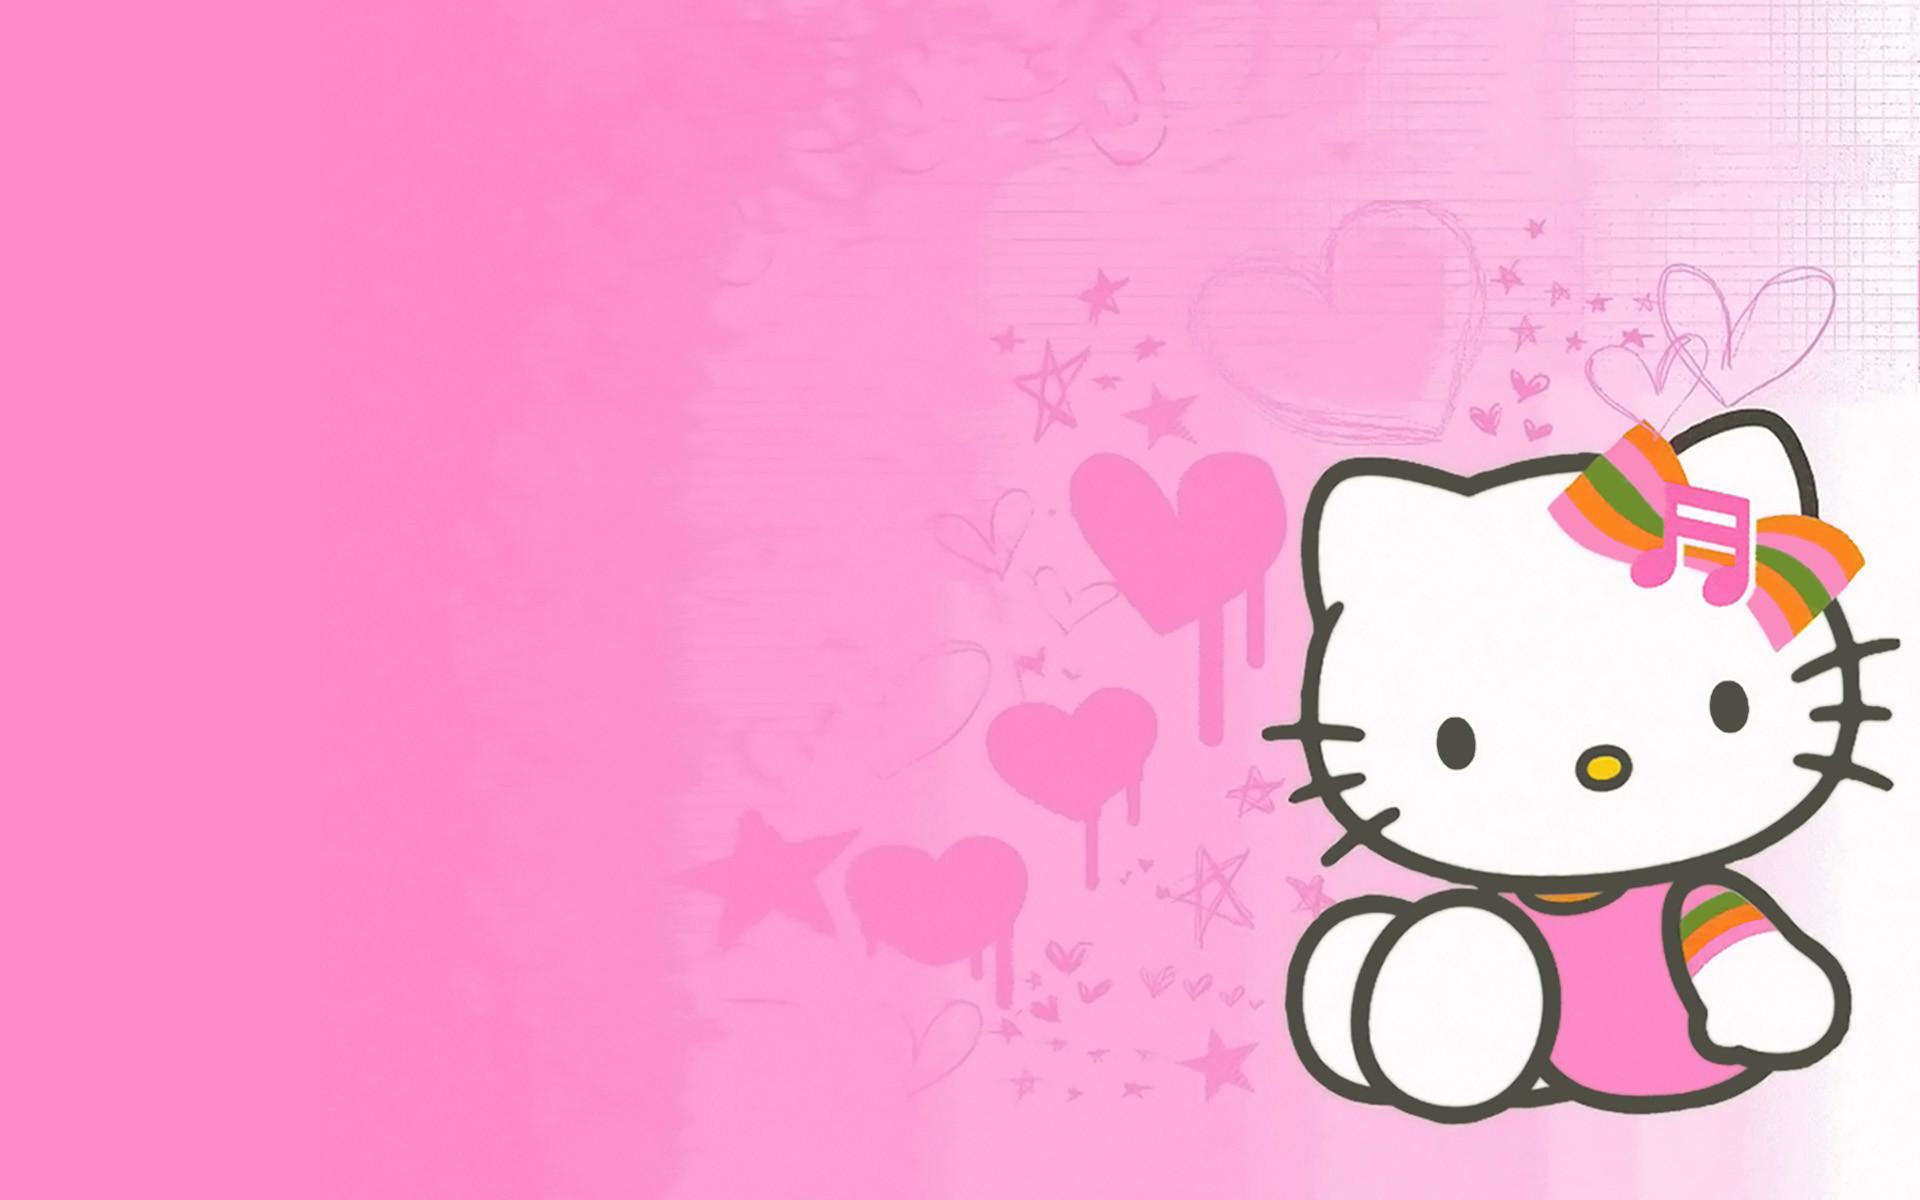 Cute Pink Wallpaper 70 Images